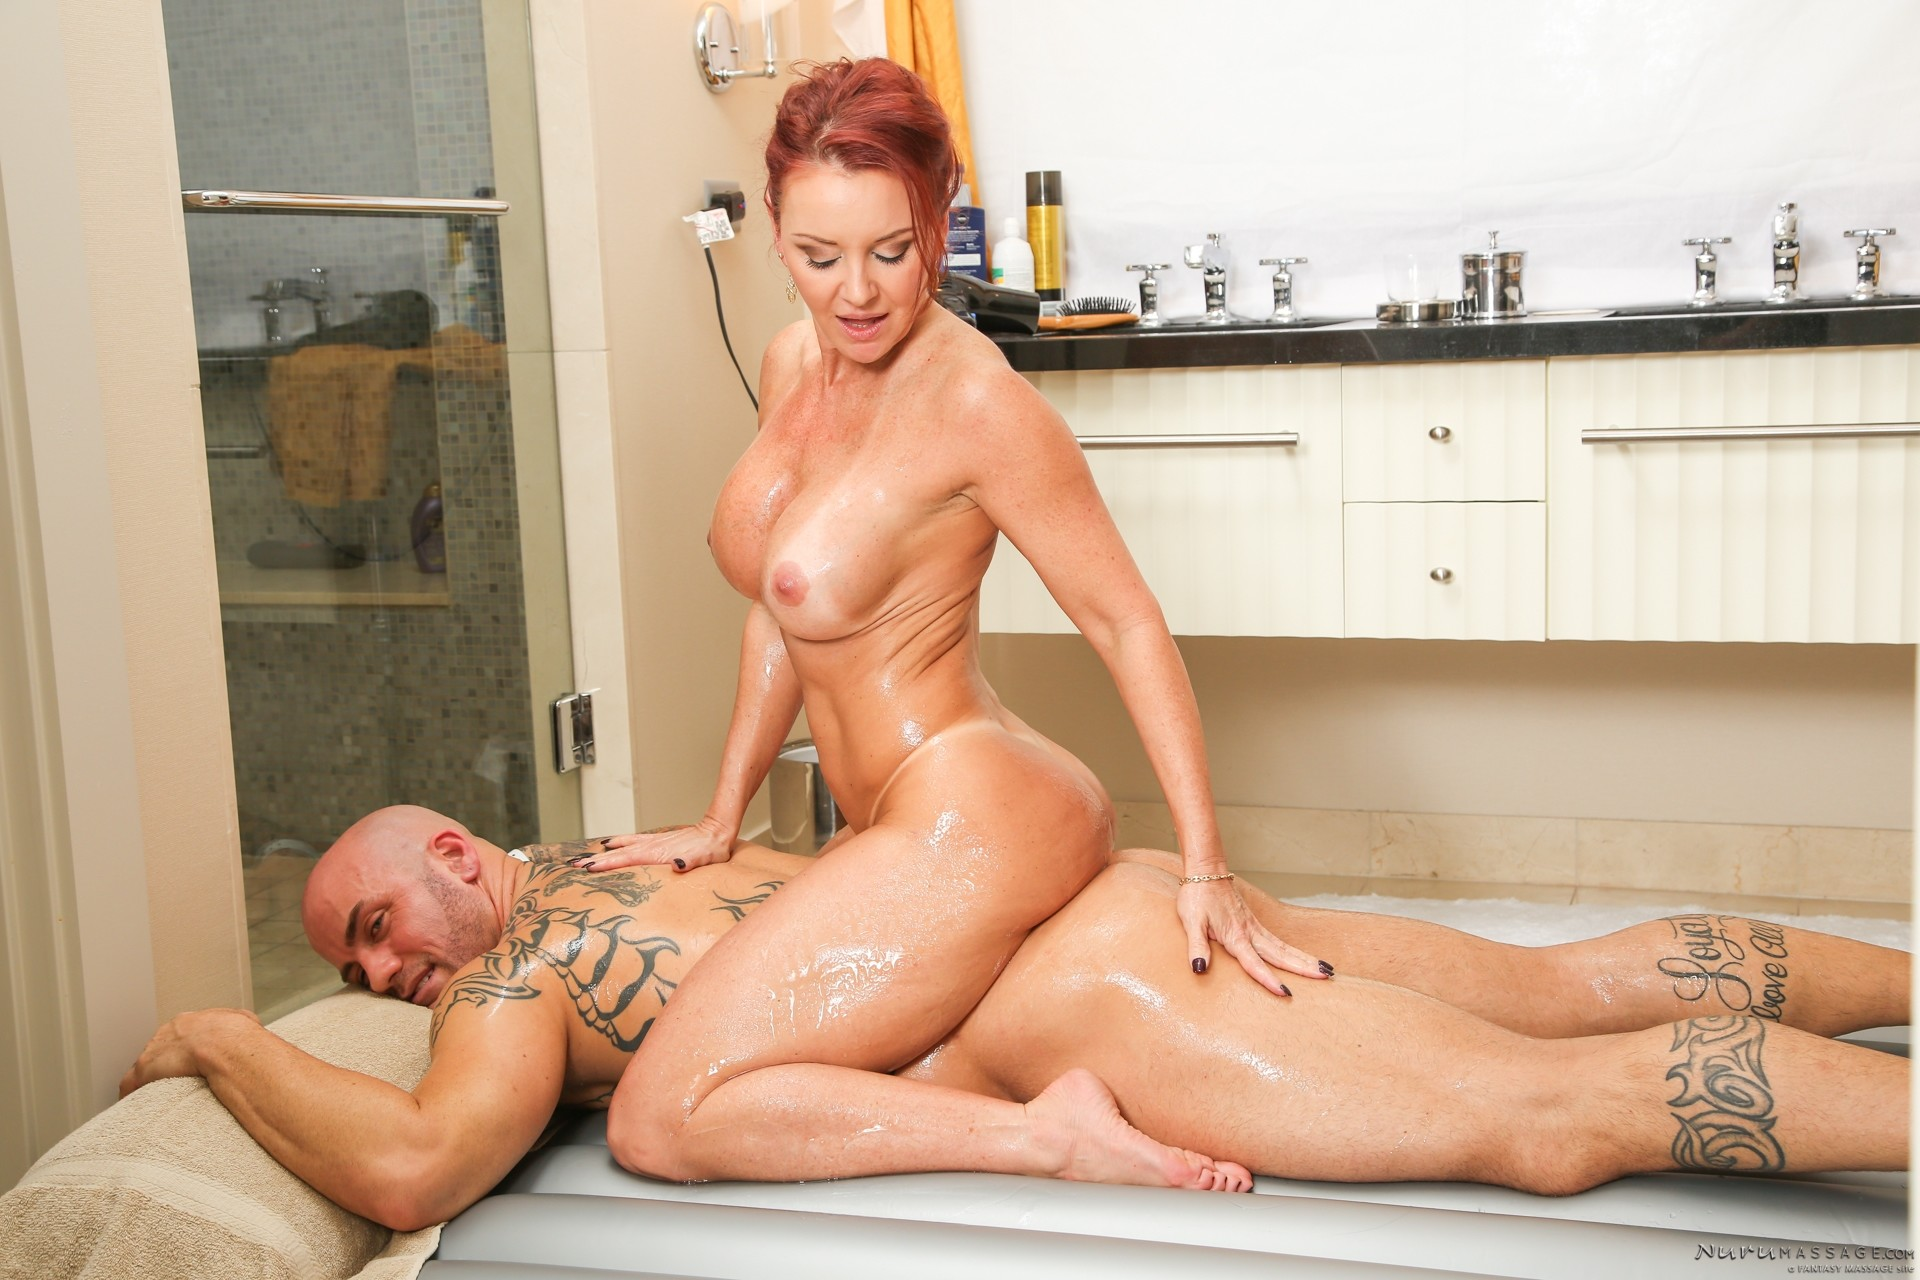 Nude ass milf anna ramboldt porr massage kungsholmen stockholm old woman sex galery mature dogfart